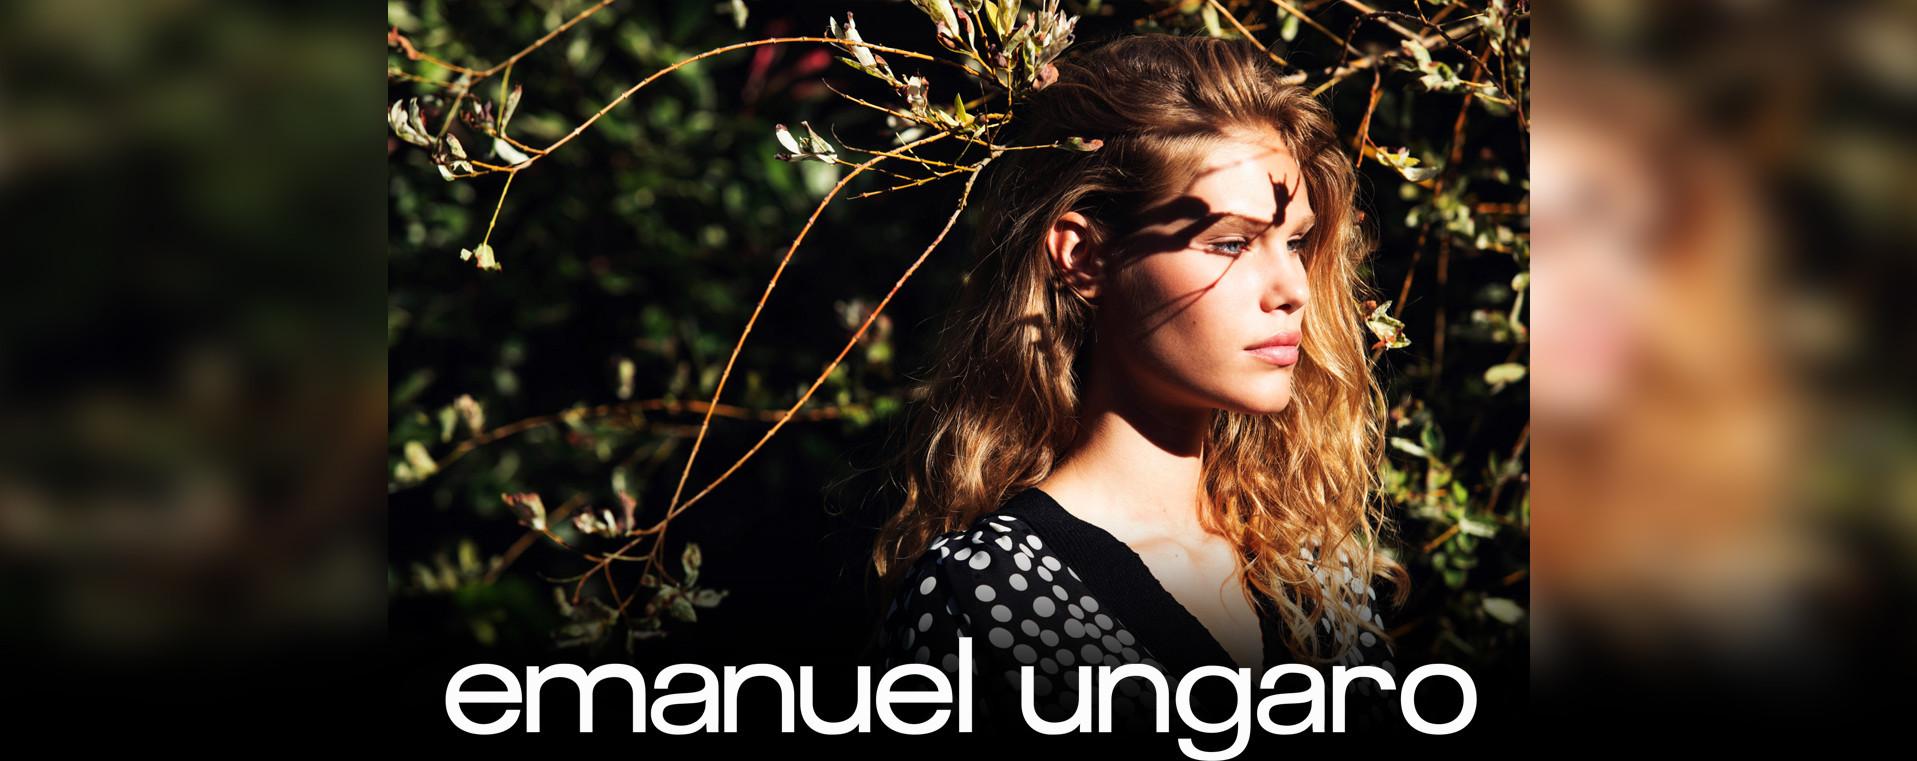 Margo Millien for EMANUEL UNGARO